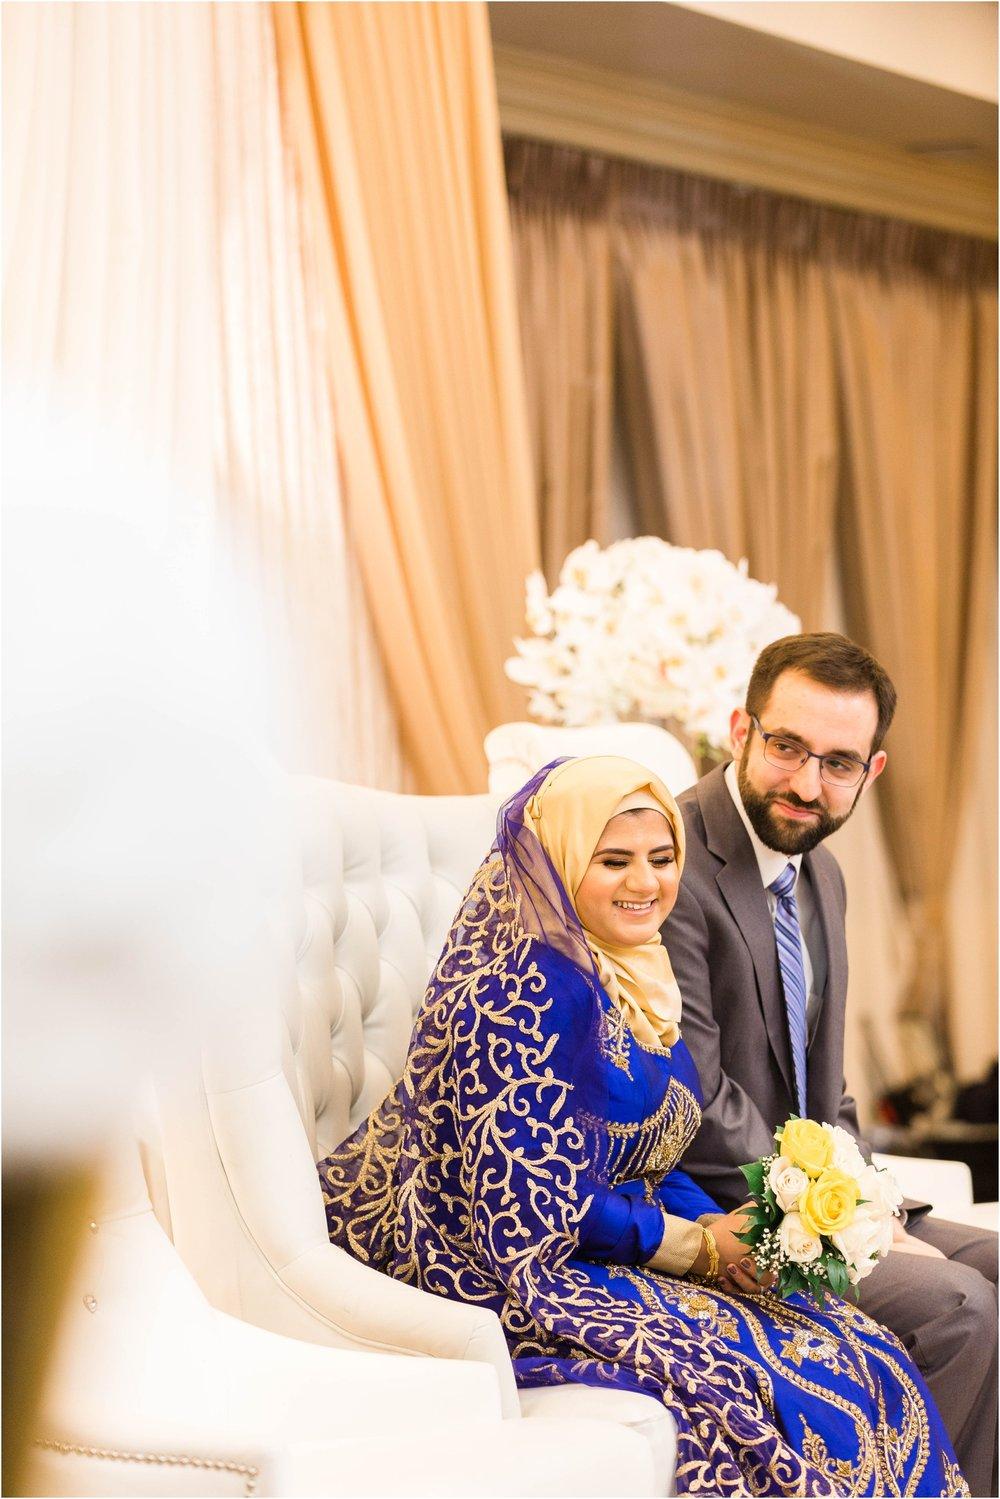 Estate-Banquet-Hall-Wedding-Toronto-Mississauga-Brampton-Scarborough-GTA-Pakistani-Indian-Wedding-Engagement-Photographer-Photography_0044.jpg